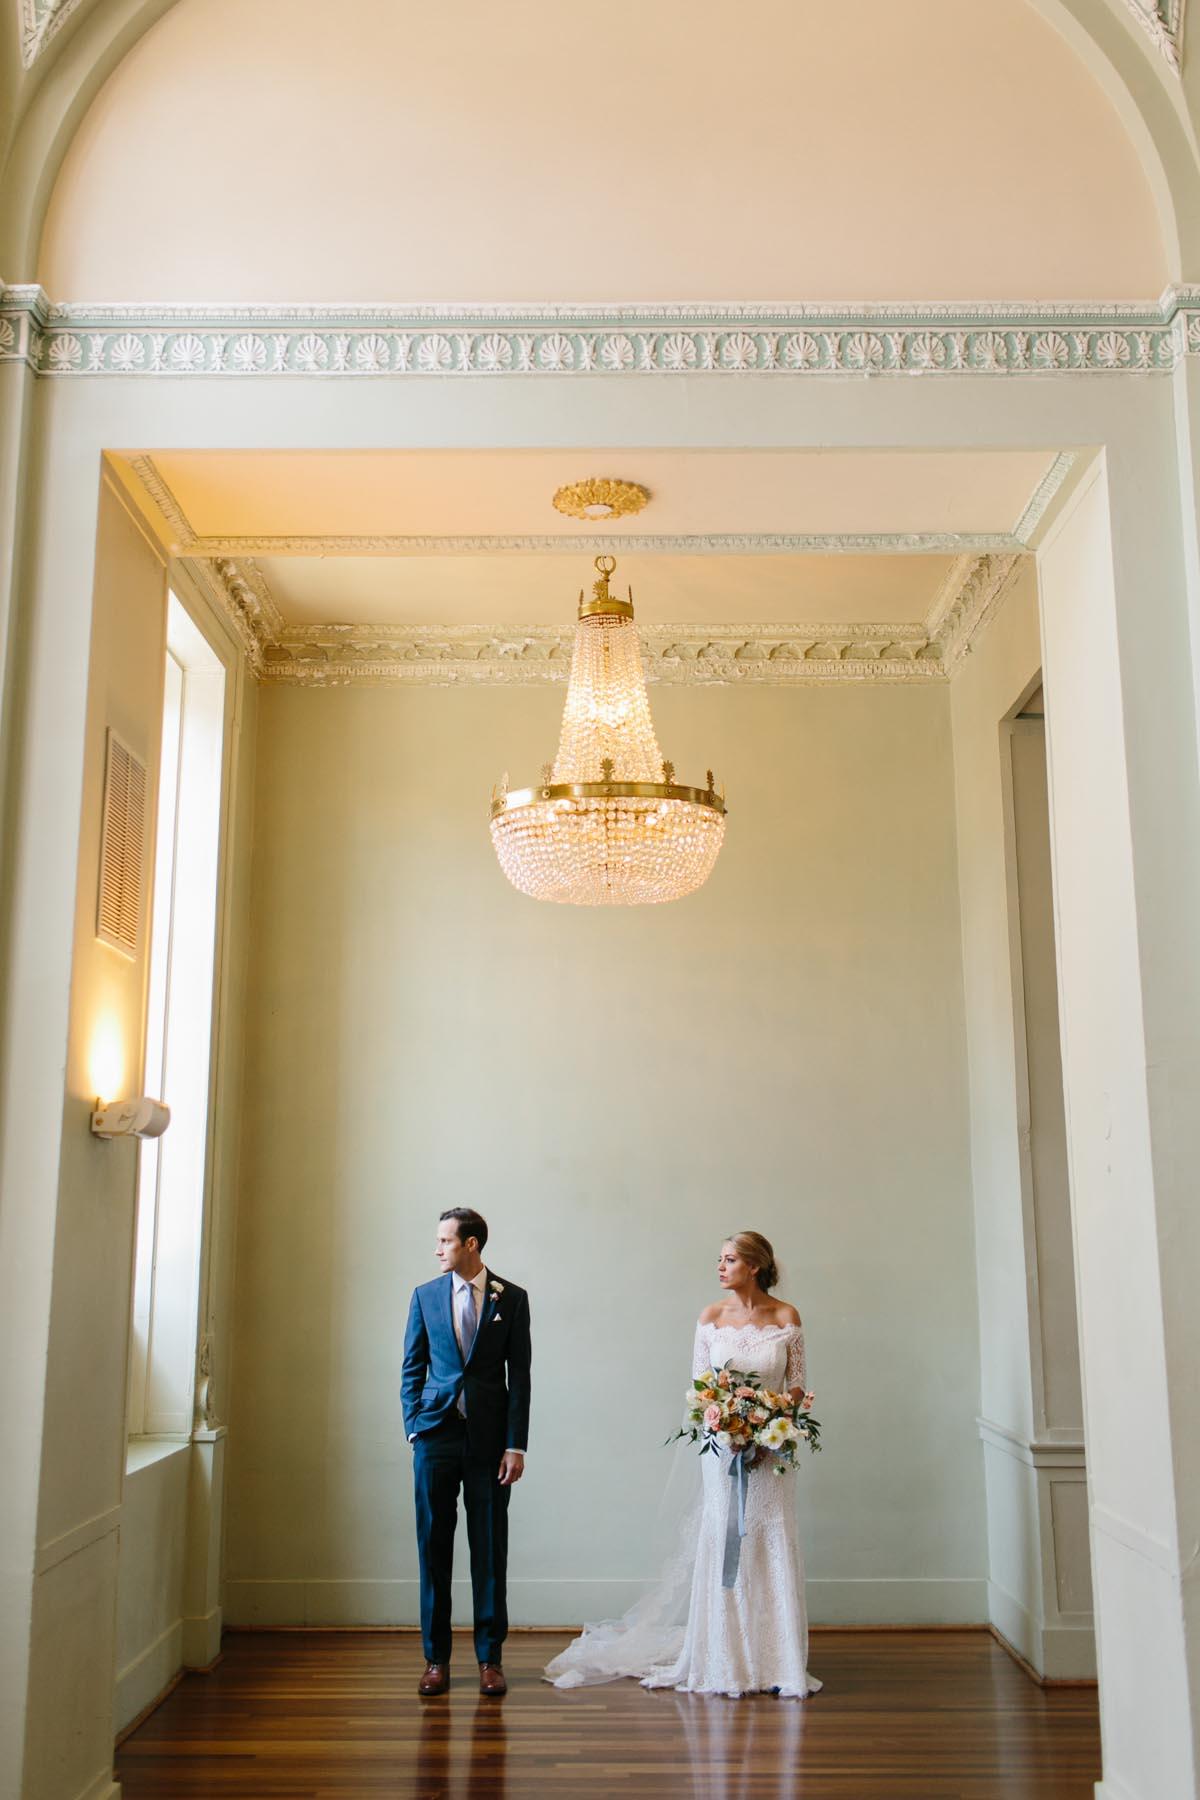 kjellman wedding blog biltmore wedding -1